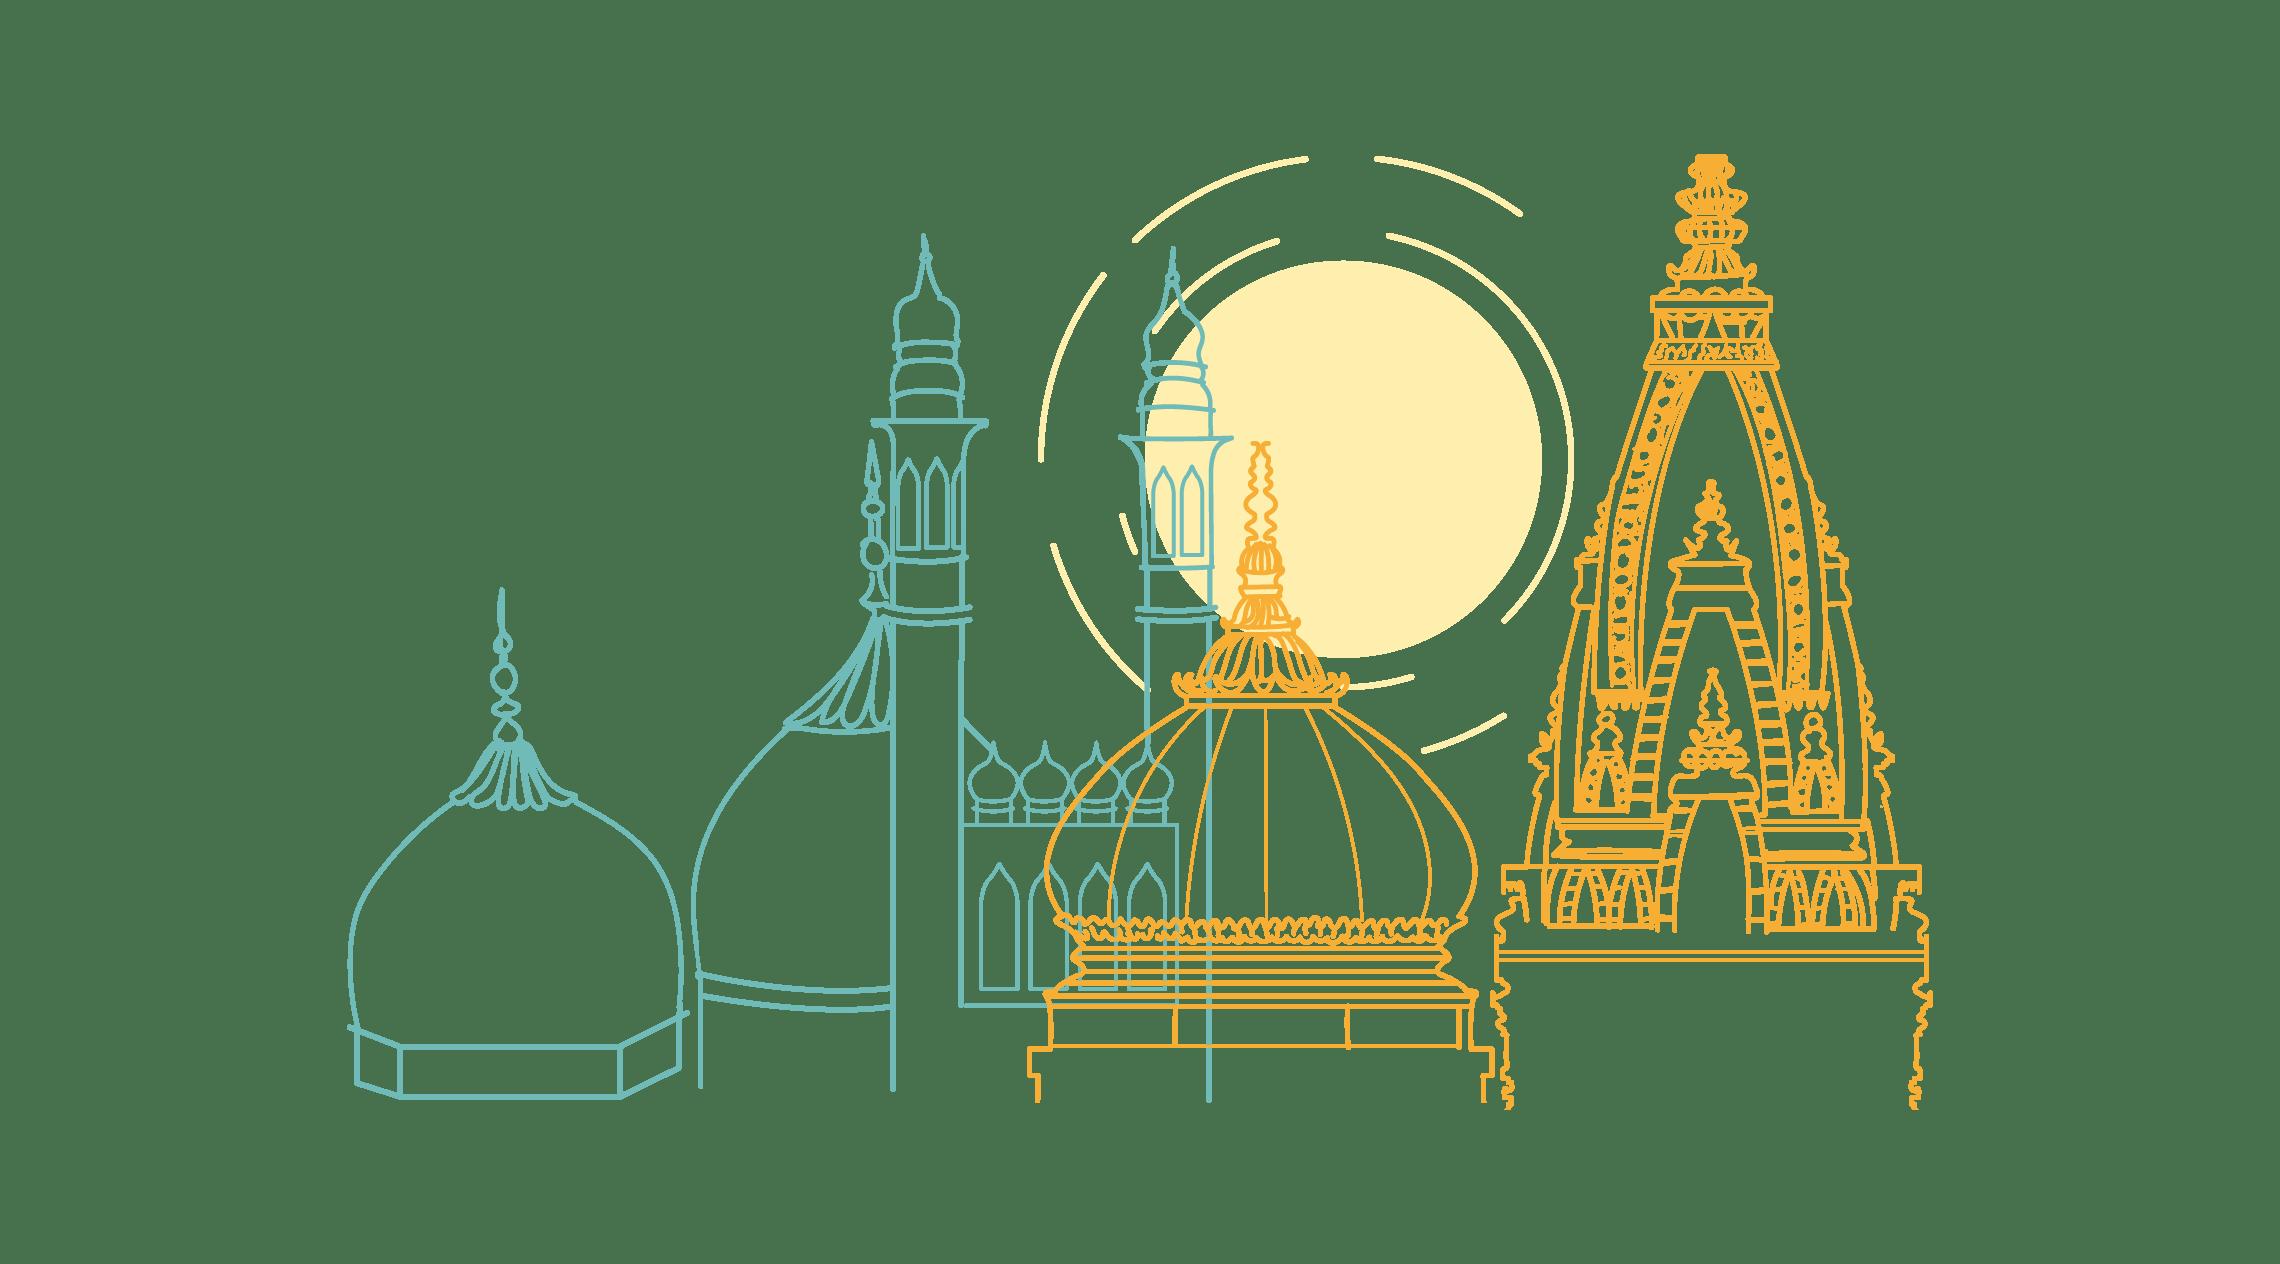 Believers by Shreevatsa Nevatia; Illustration - Akshaya Zachariah